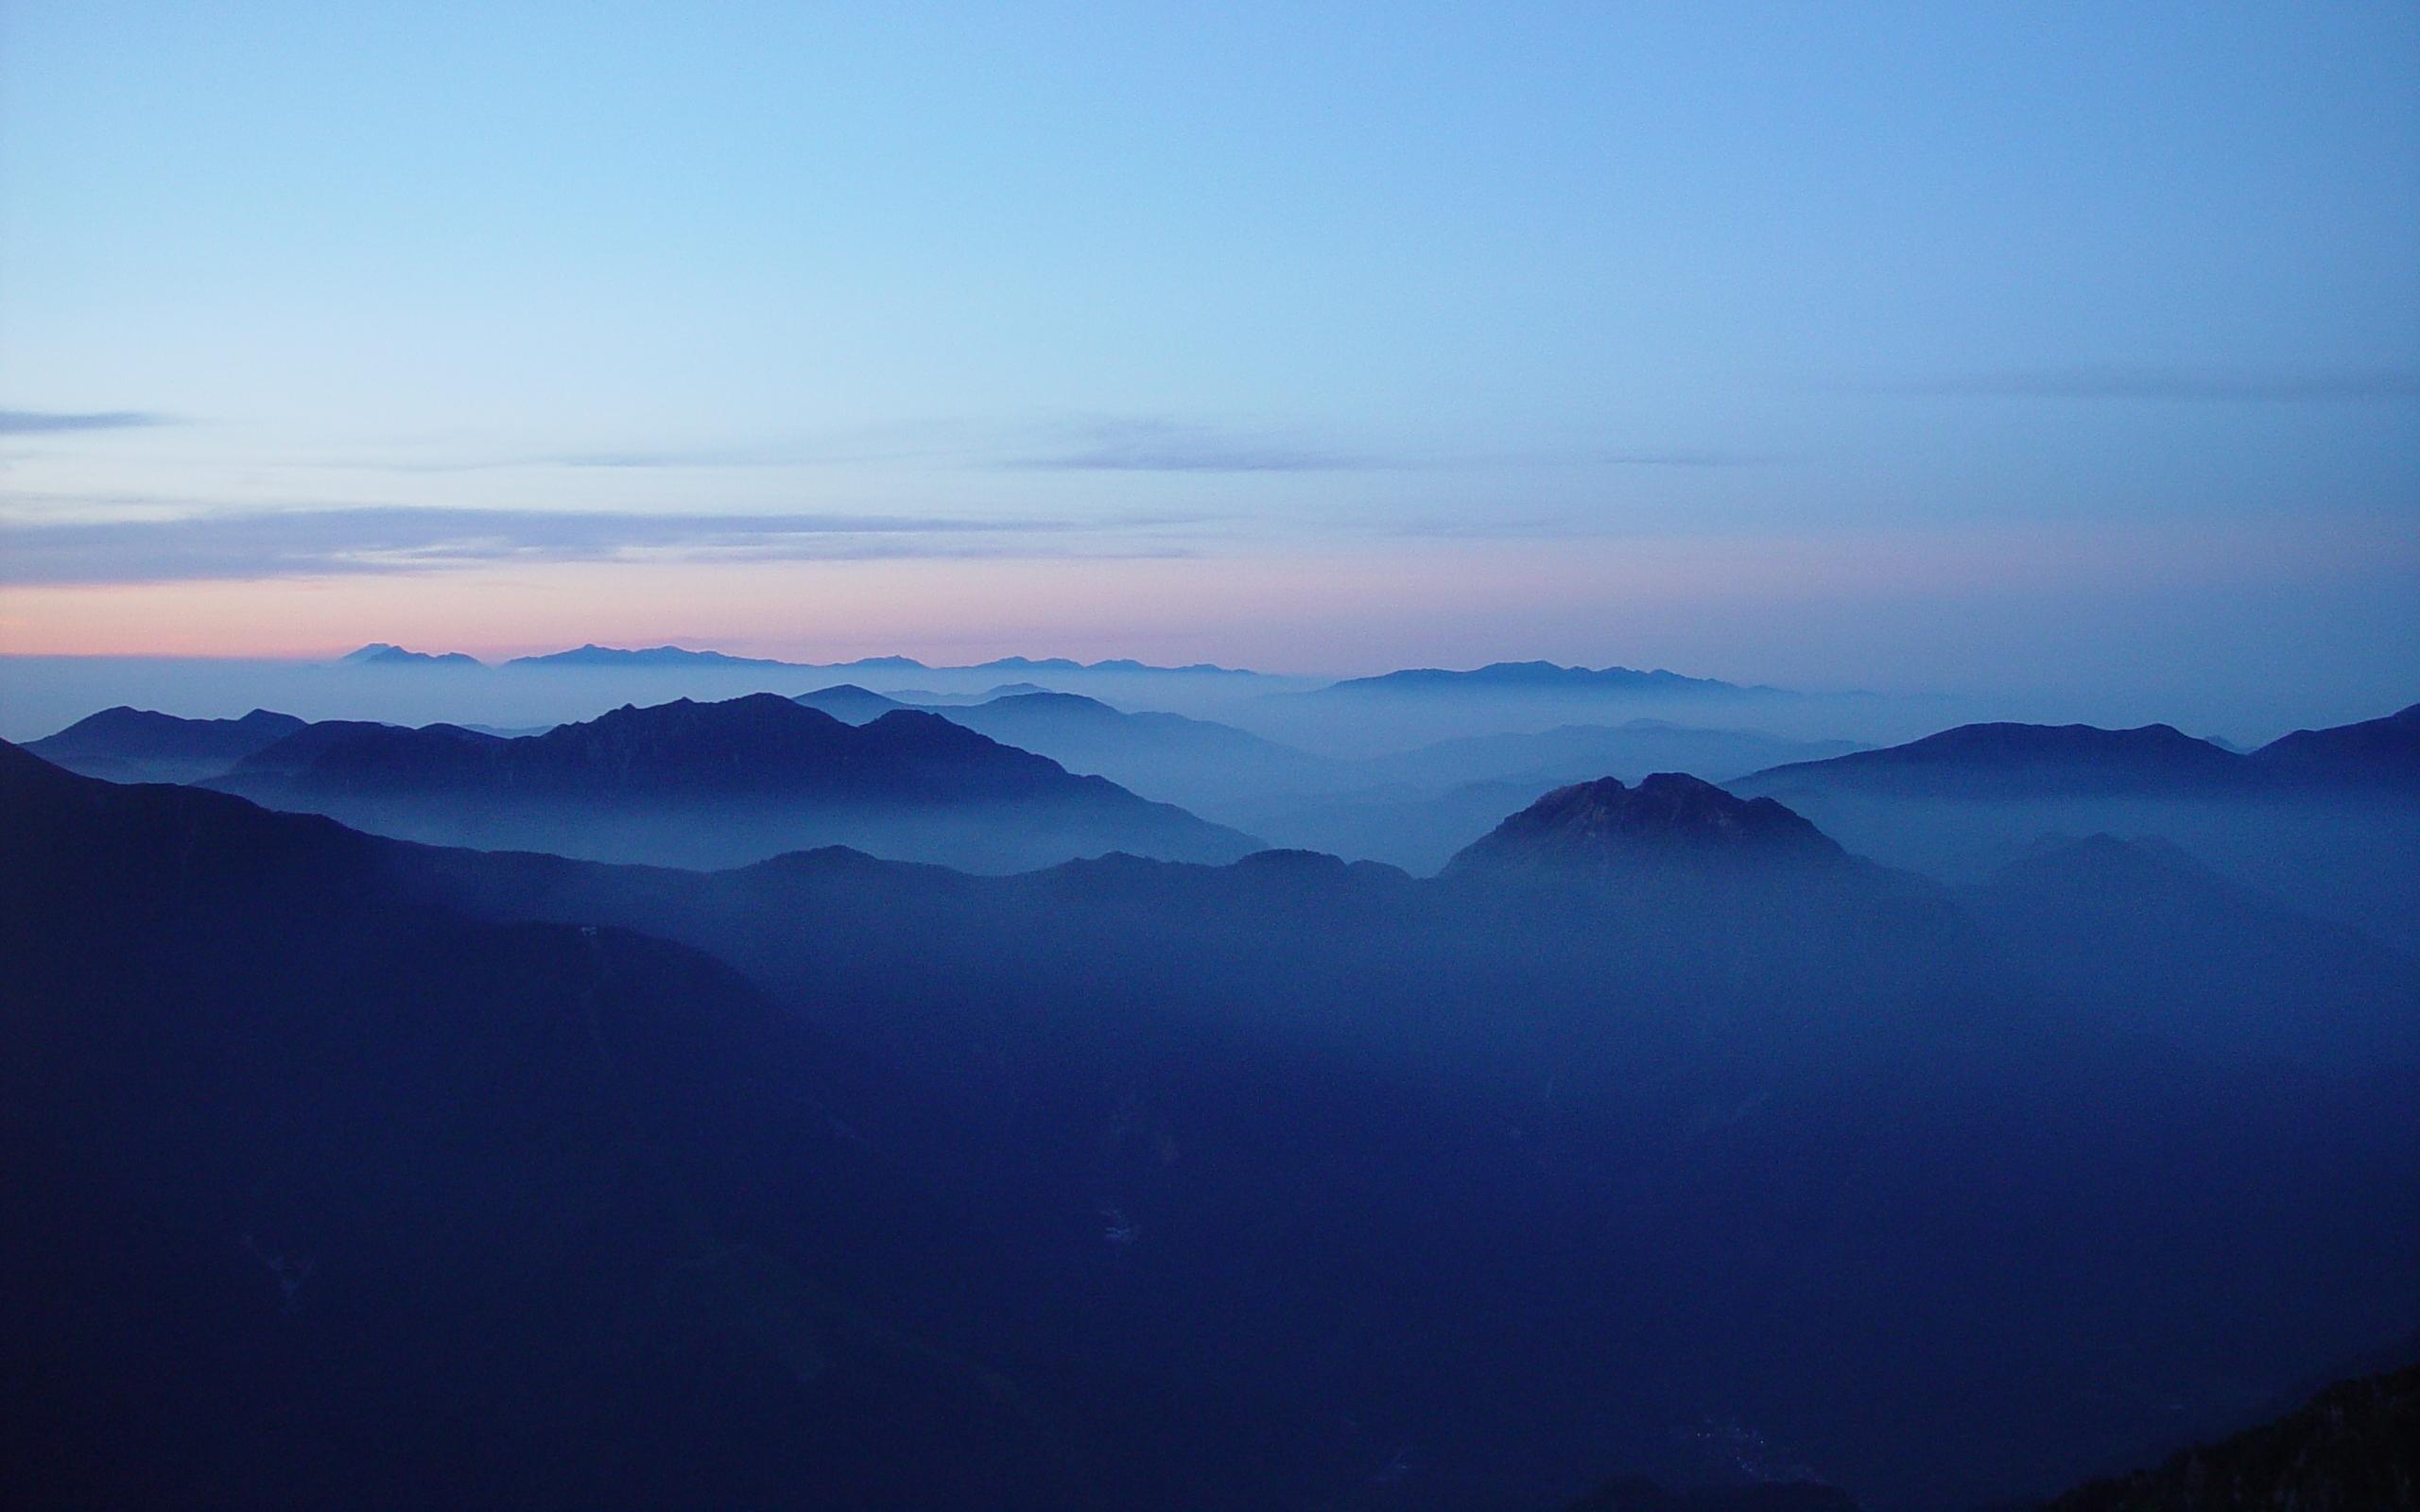 file:mount fuji and akaishi mountains from mount kasa